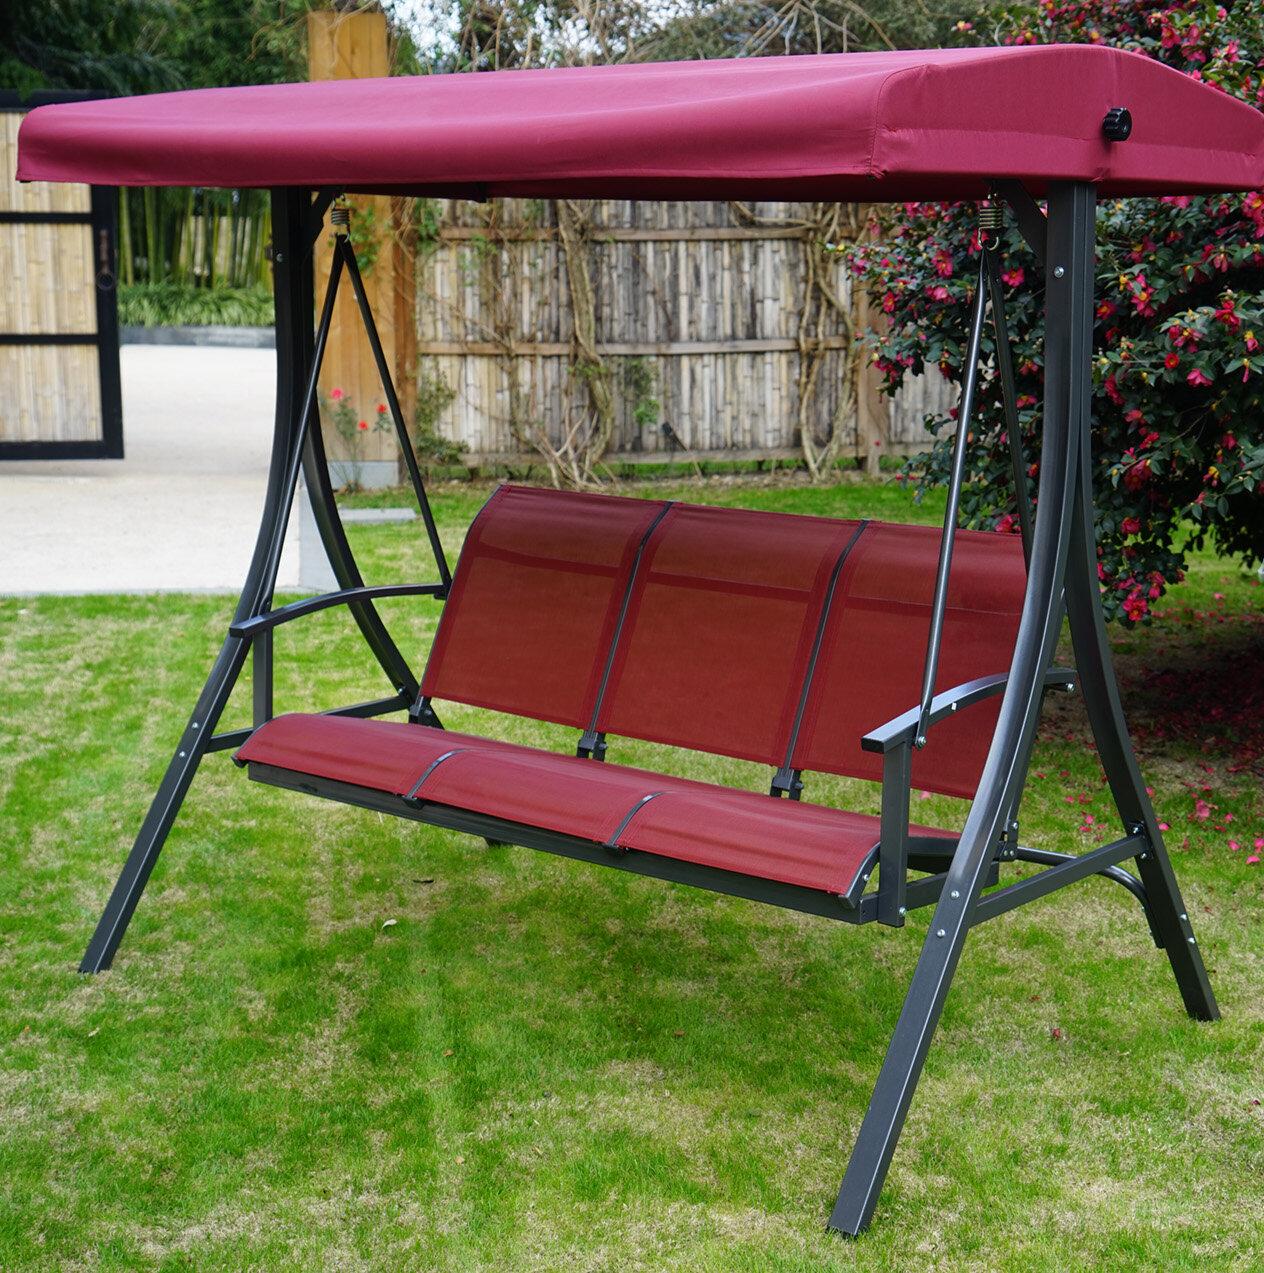 Winston Porter Otteridge Patio Porch Swing With Stand Intended For Patio Porch Swings With Stand (View 22 of 25)